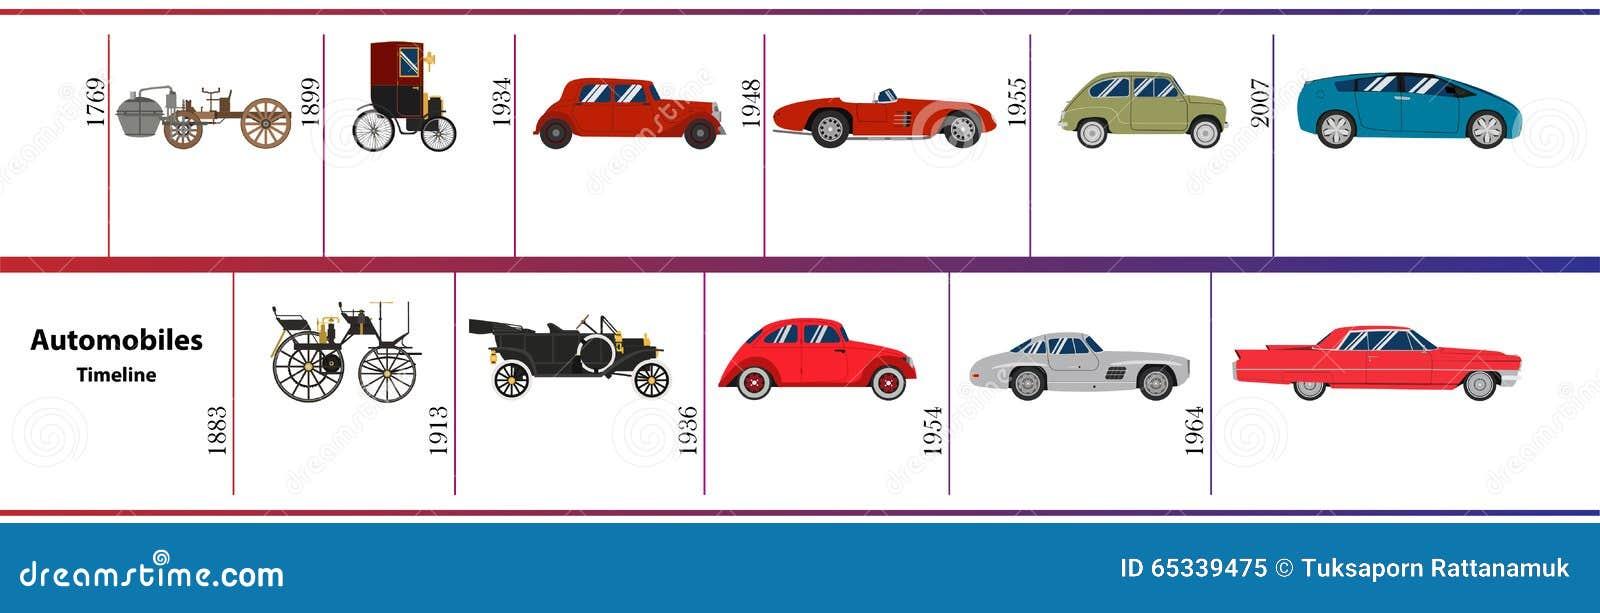 Amazing Timeline Of Automobiles Gallery - Classic Cars Ideas - boiq.info